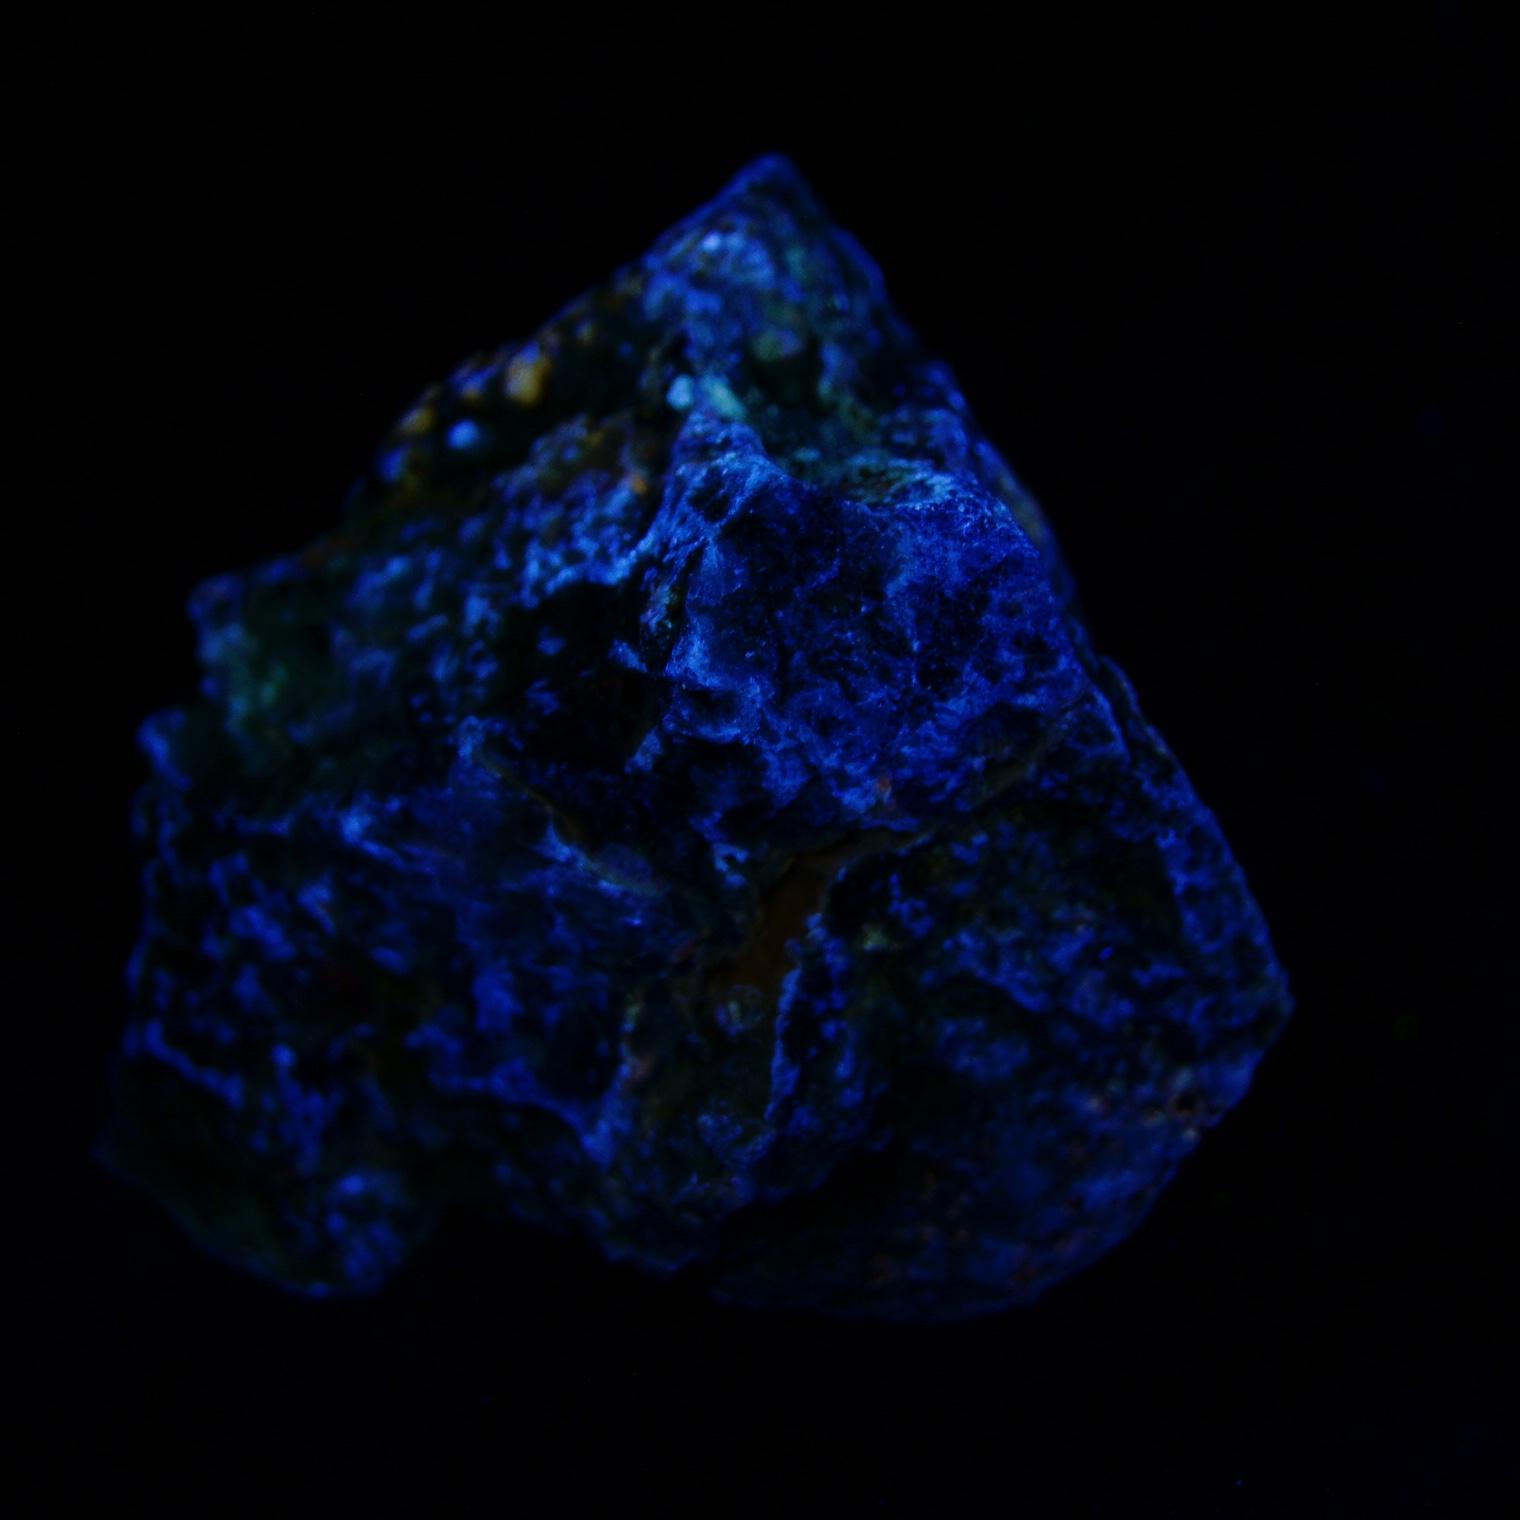 Colección de Minerales Fluorescentes - Página 5 Fullsi51